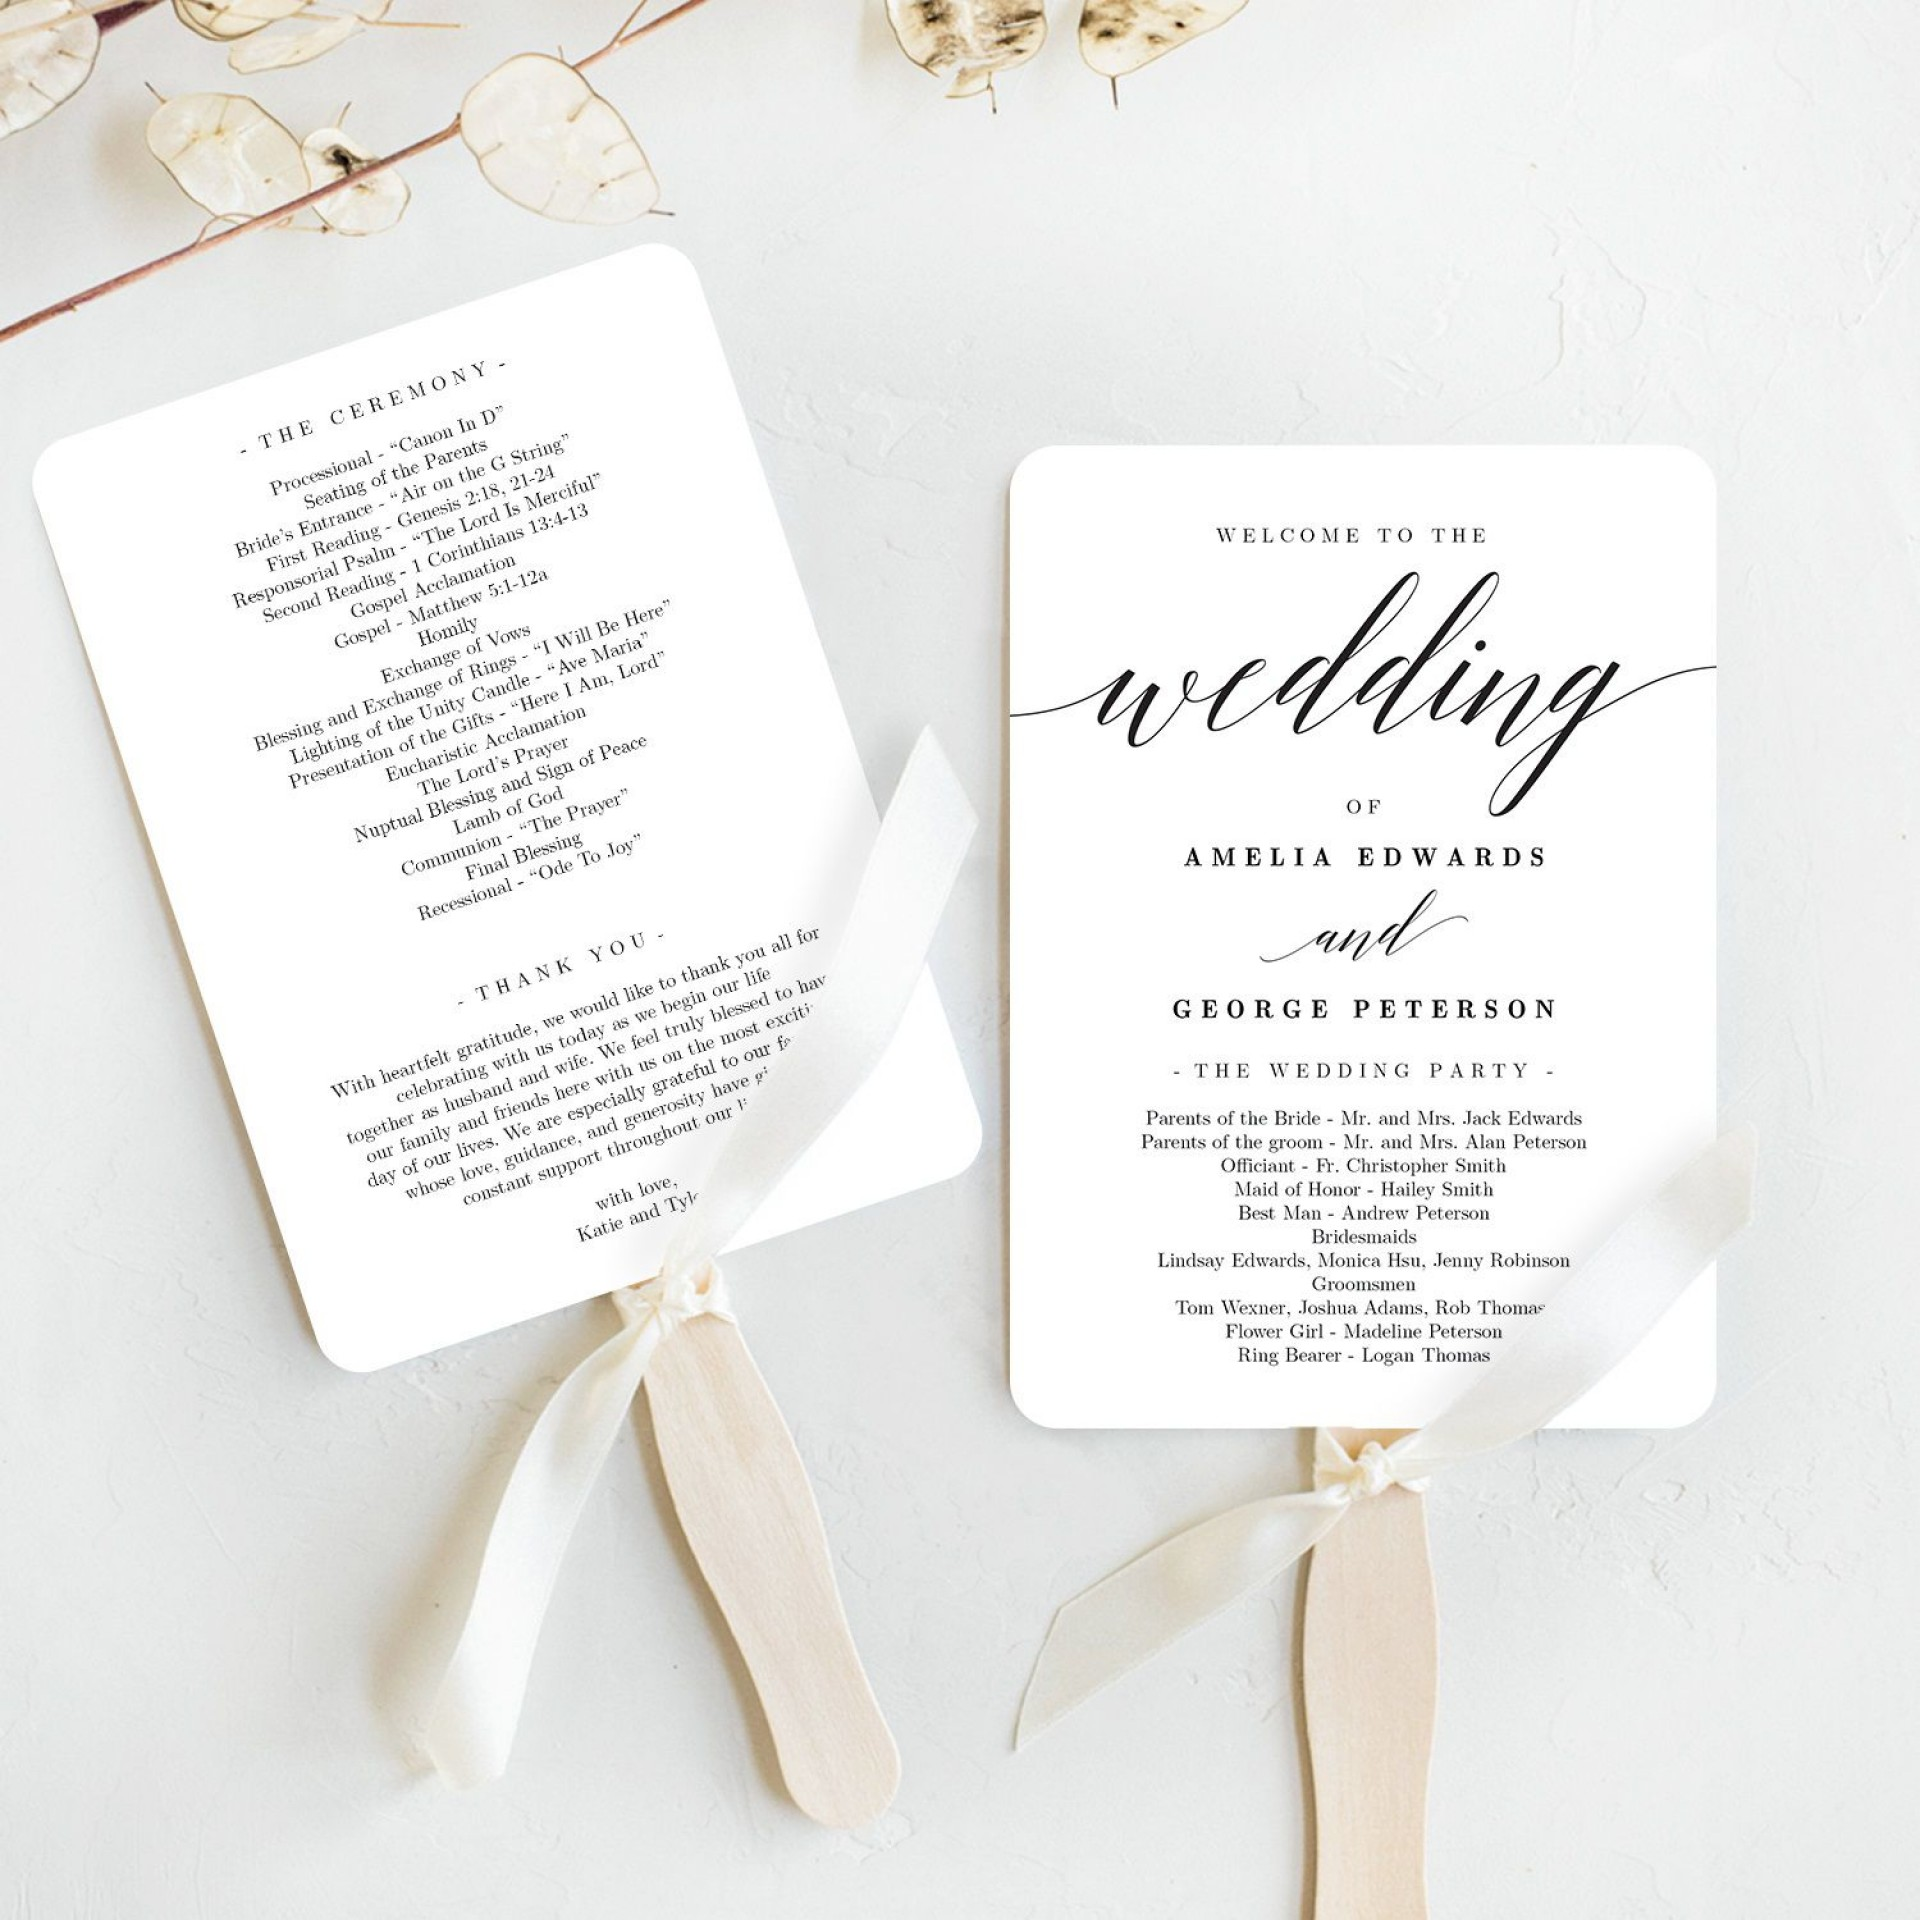 007 Formidable Free Printable Wedding Program Template Inspiration  Templates Microsoft Word Indian1920